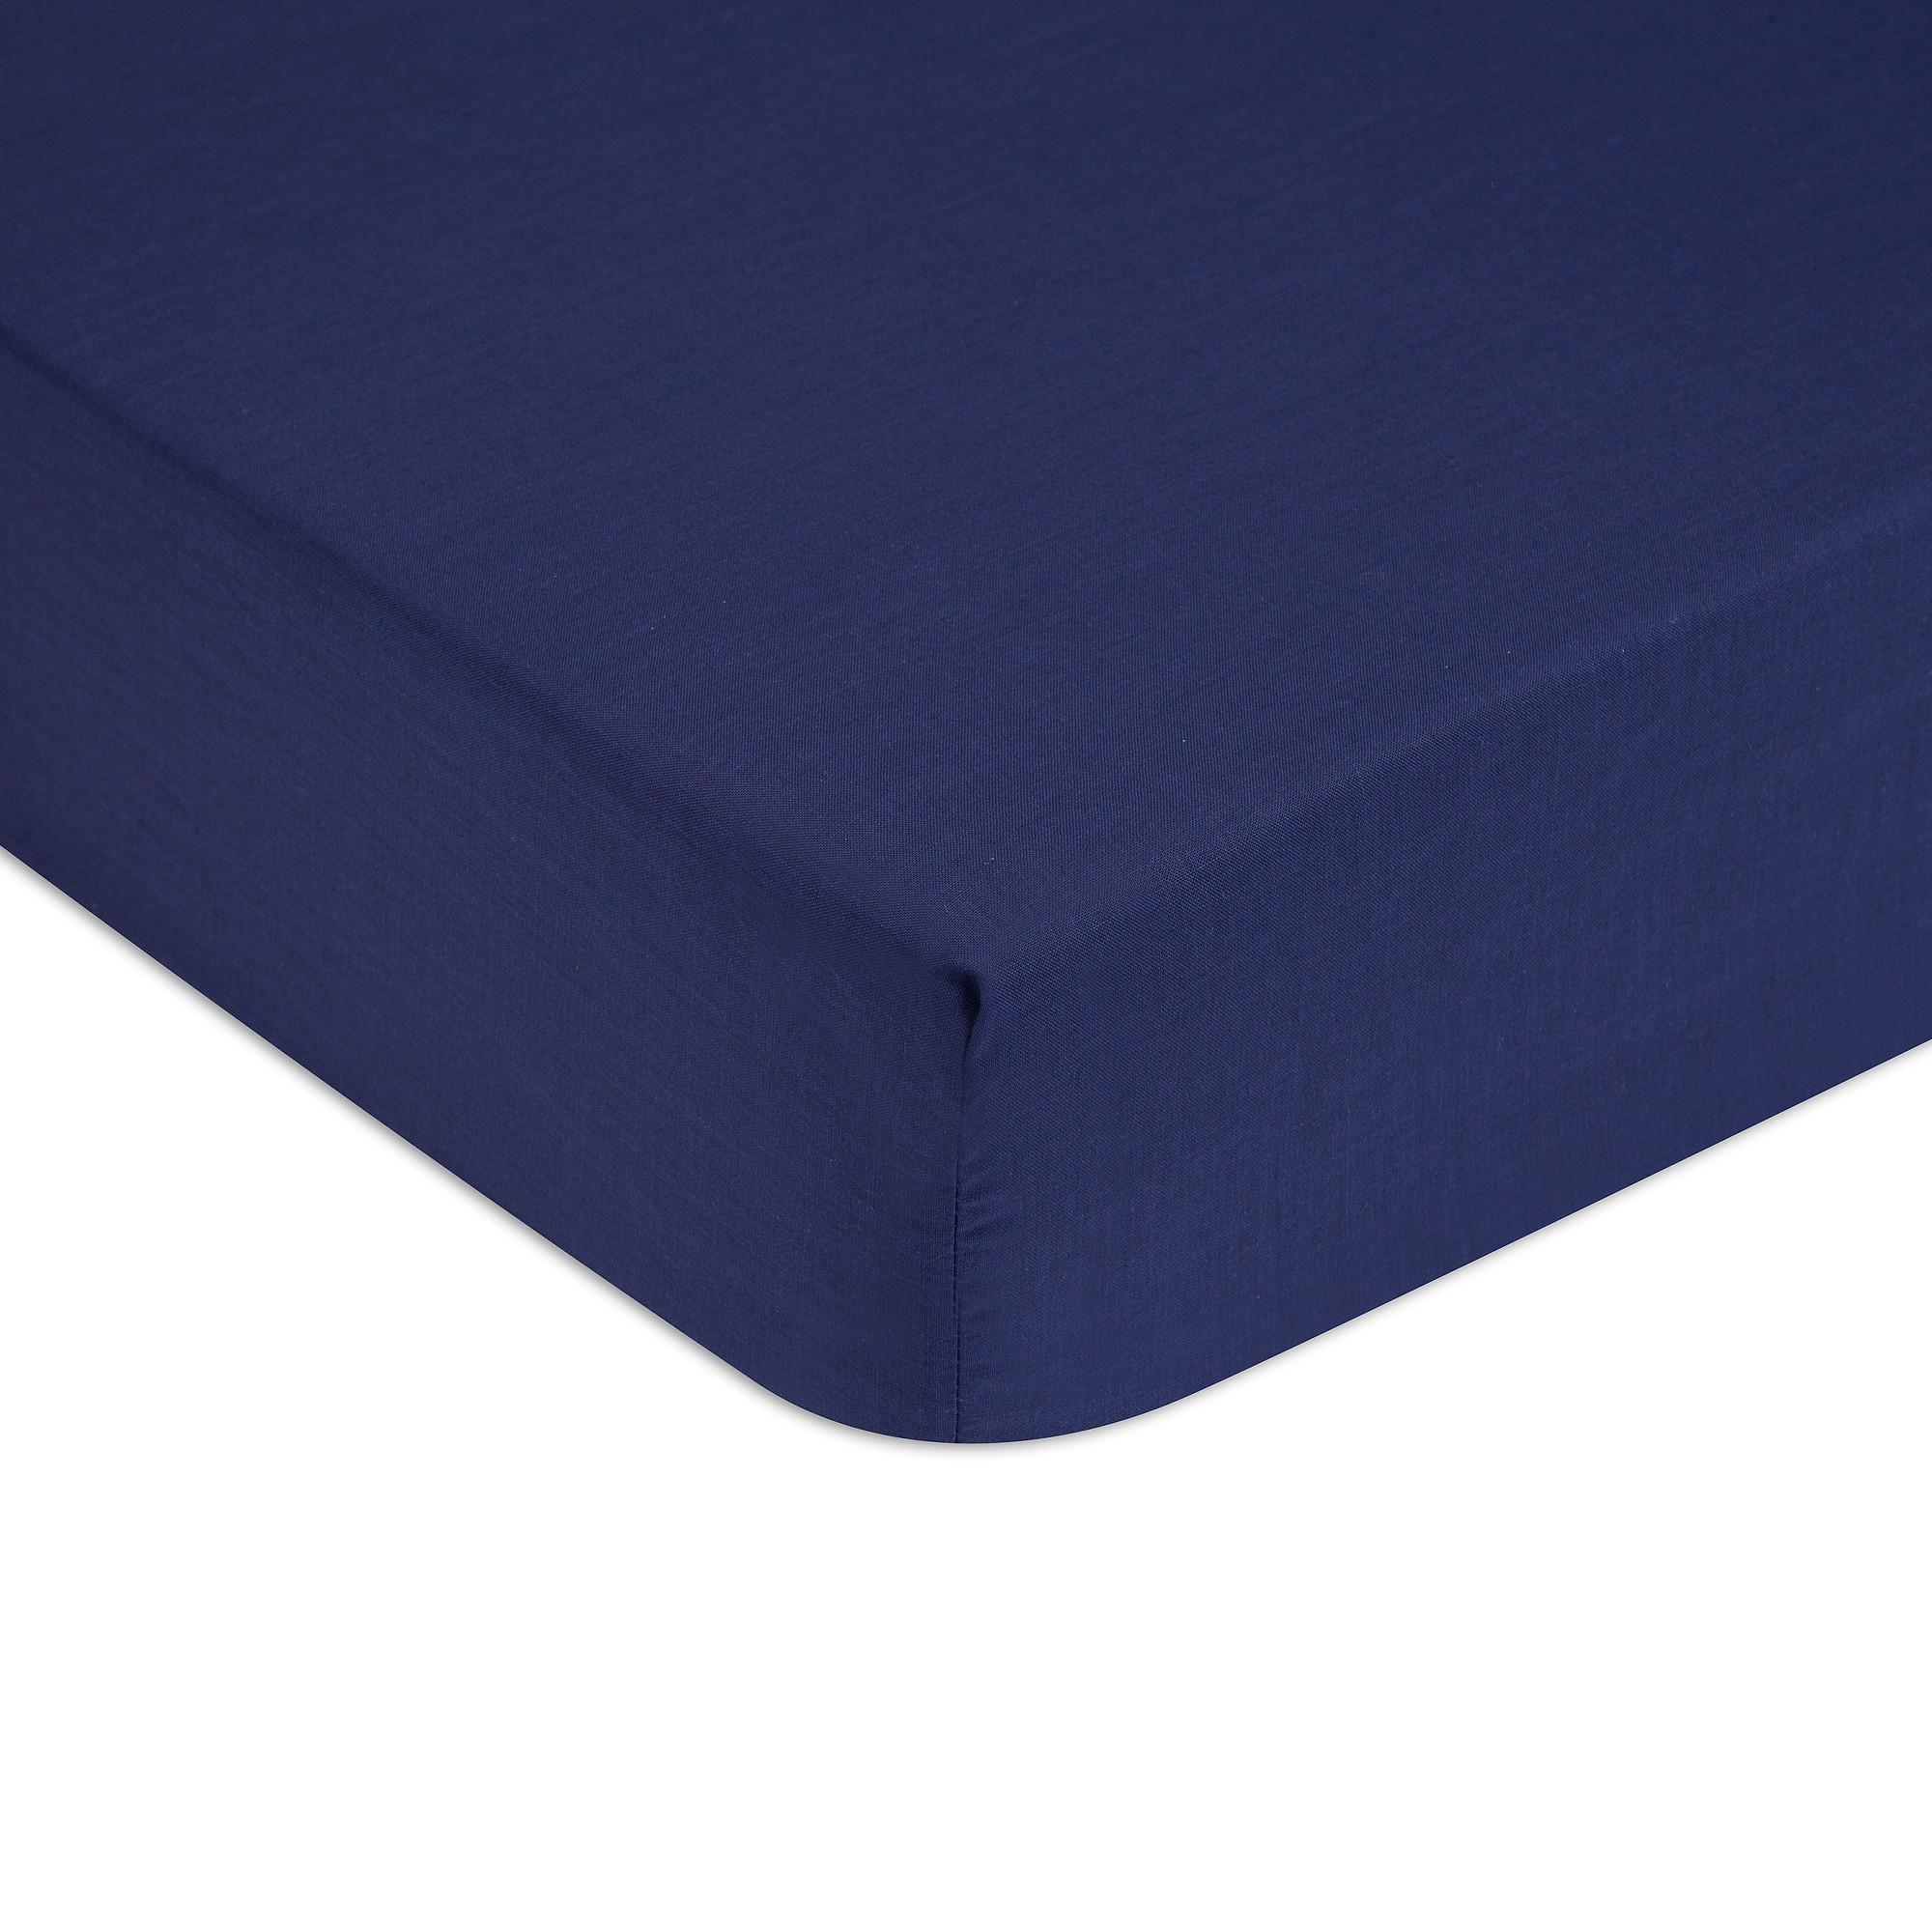 Cearceaf de pat cu elastic Tommy Hilfiger Unis Percale Albastru Navy imagine